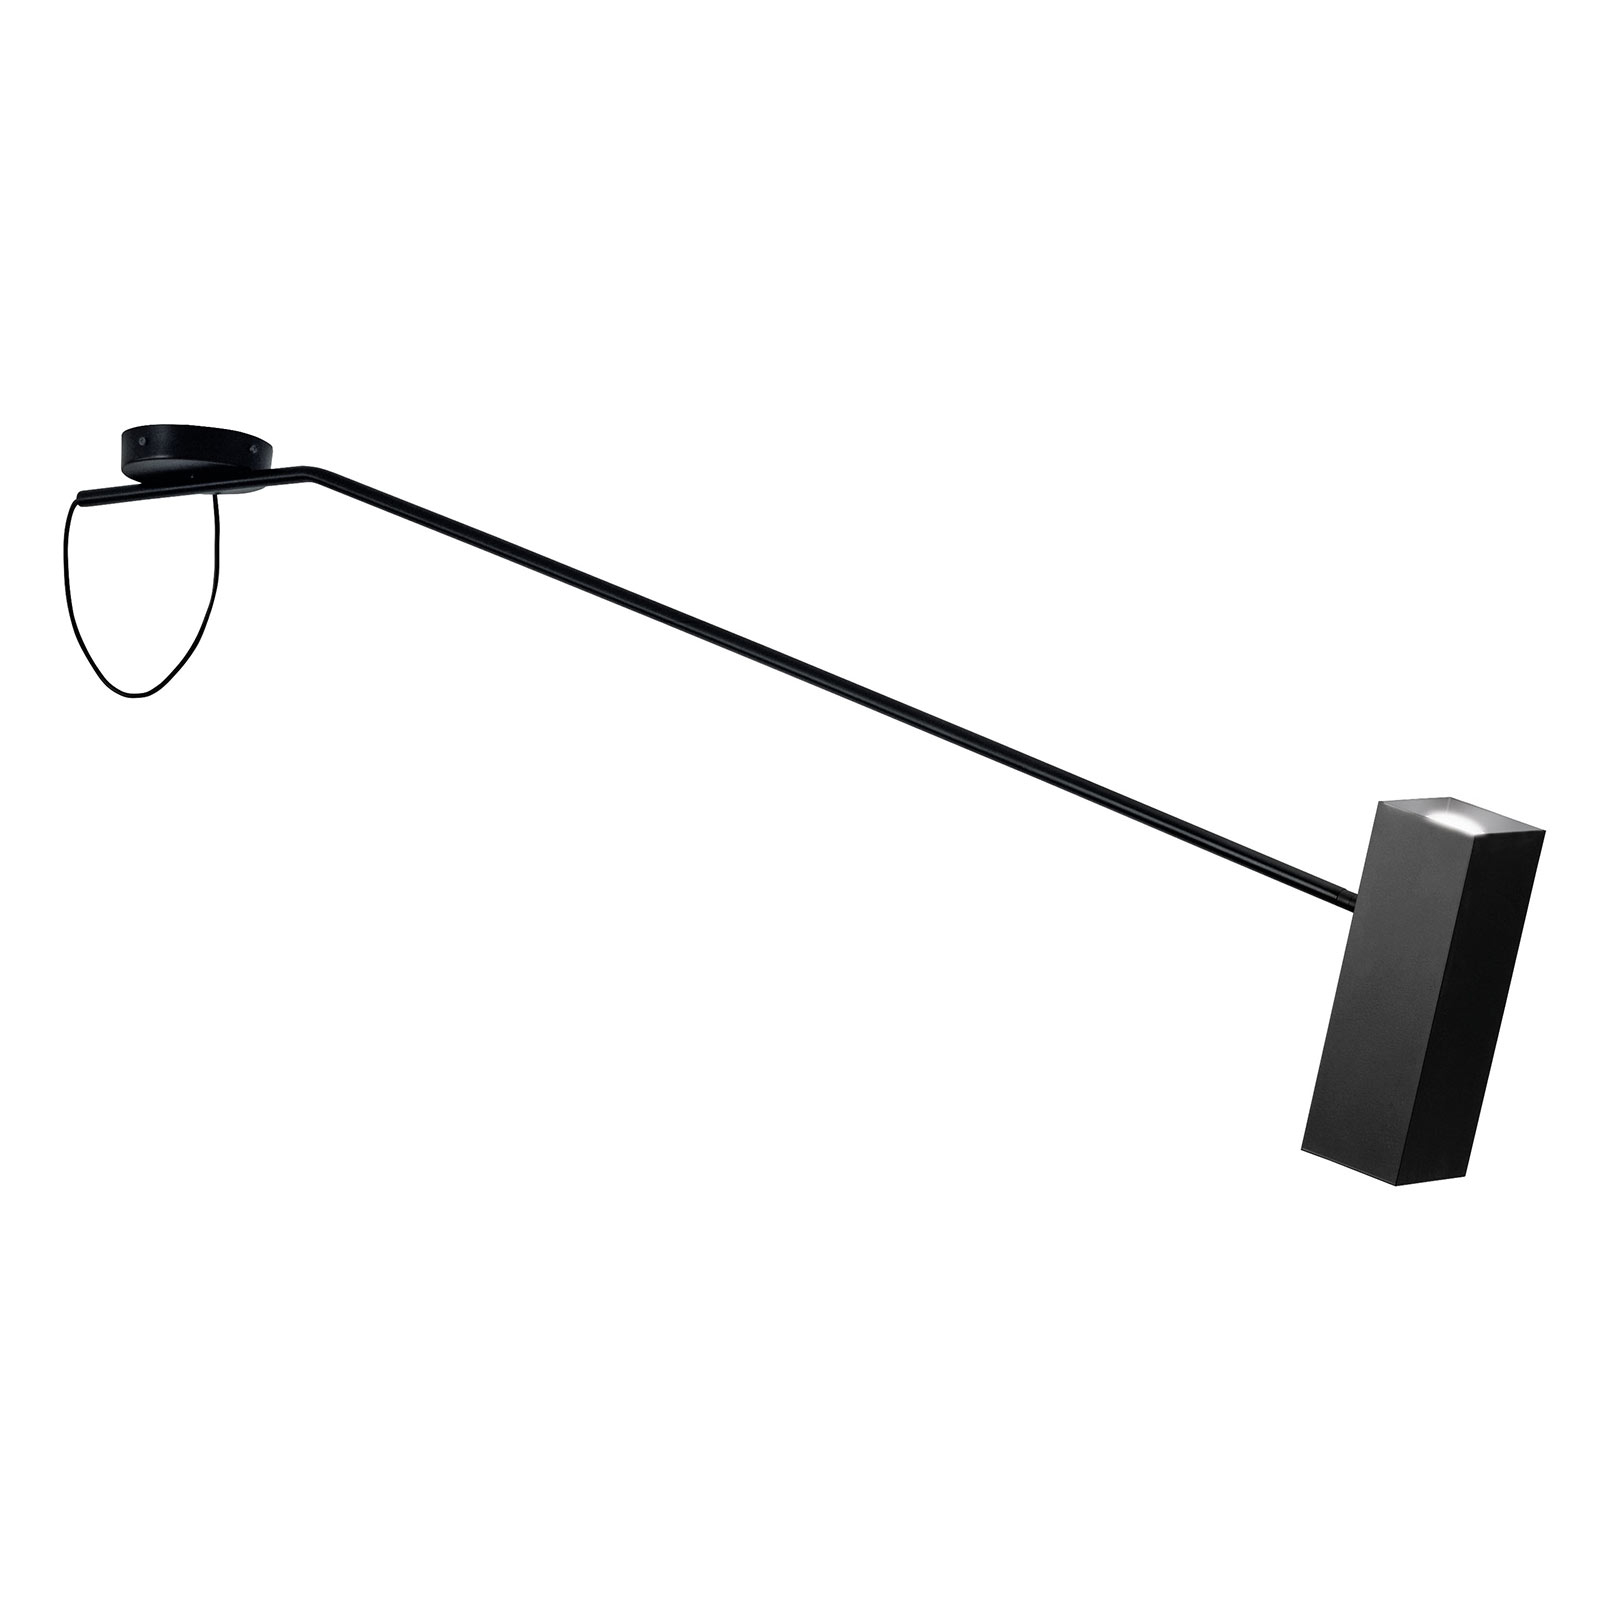 Modo Luce Dejavú kattovalaisin, 165 cm musta